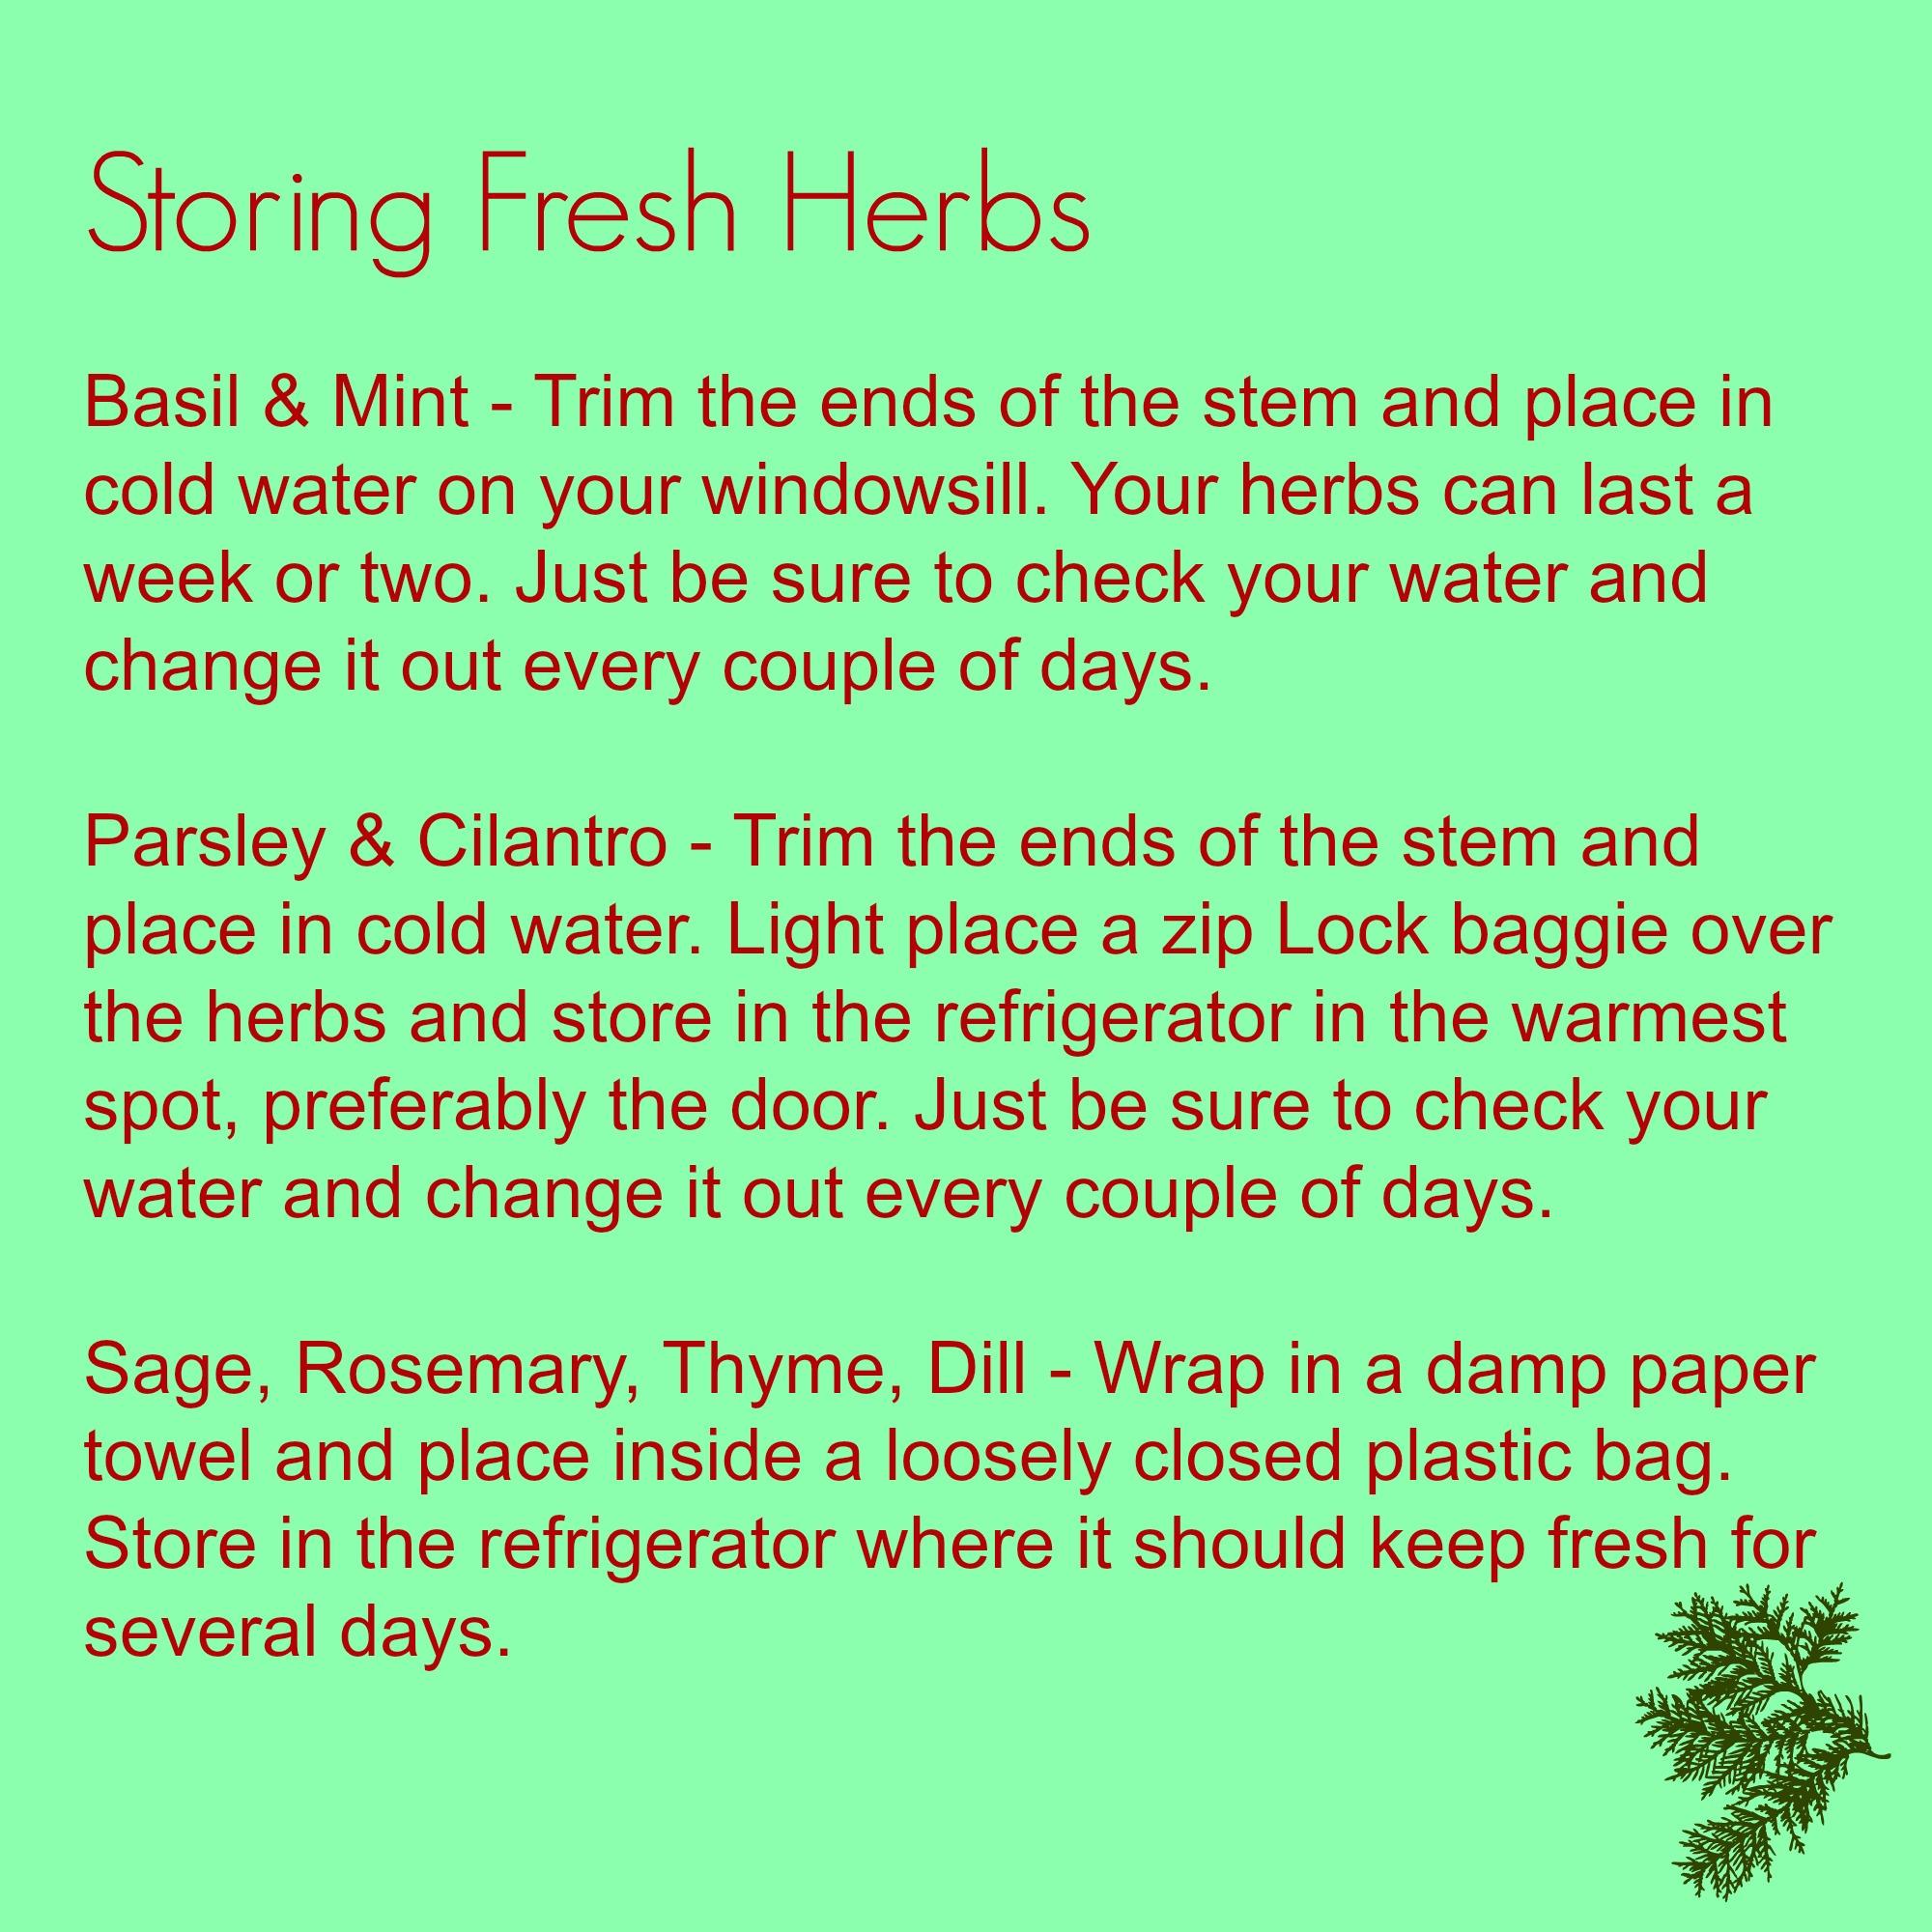 Storing Fresh Herbs